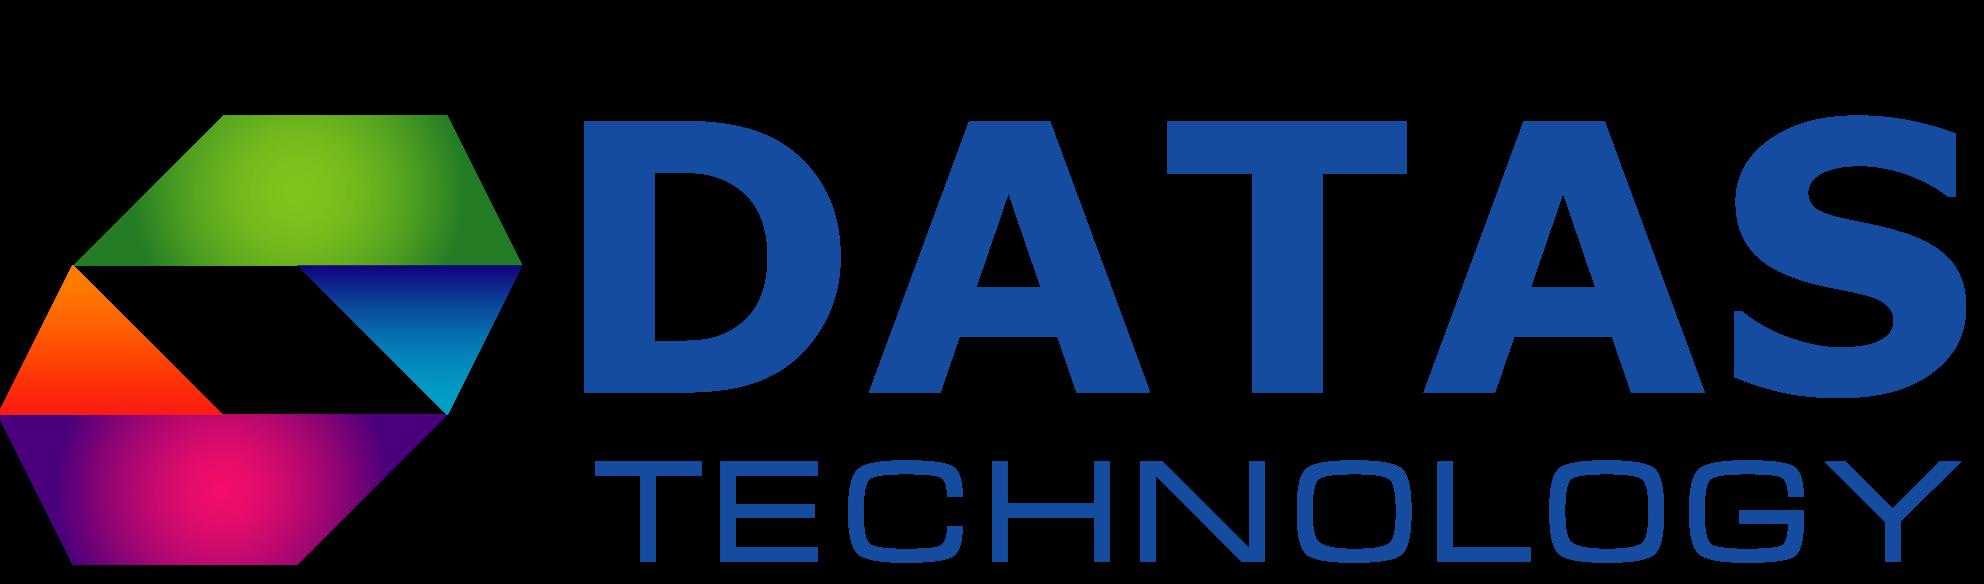 DATAS Technology